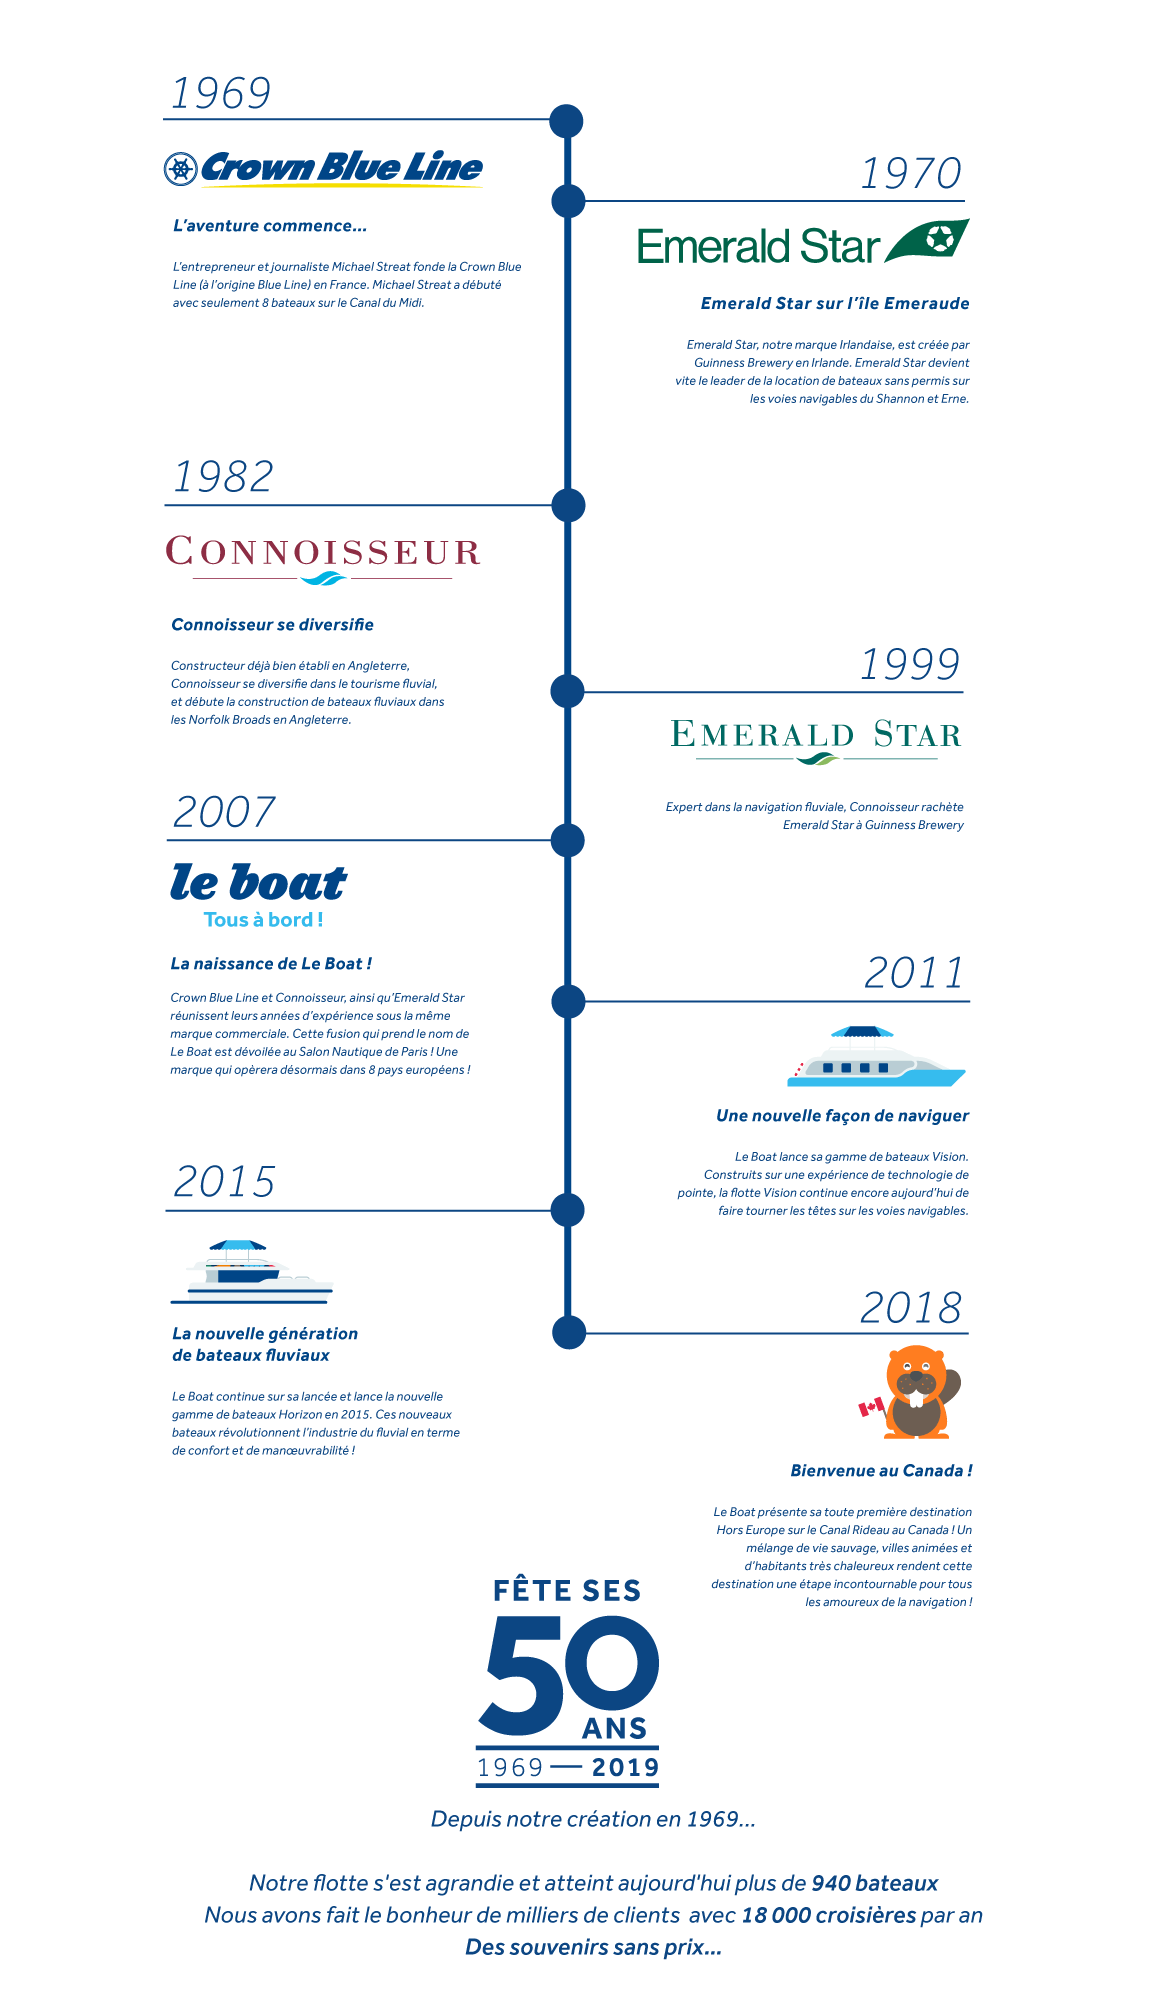 L'histoire de Le Boat